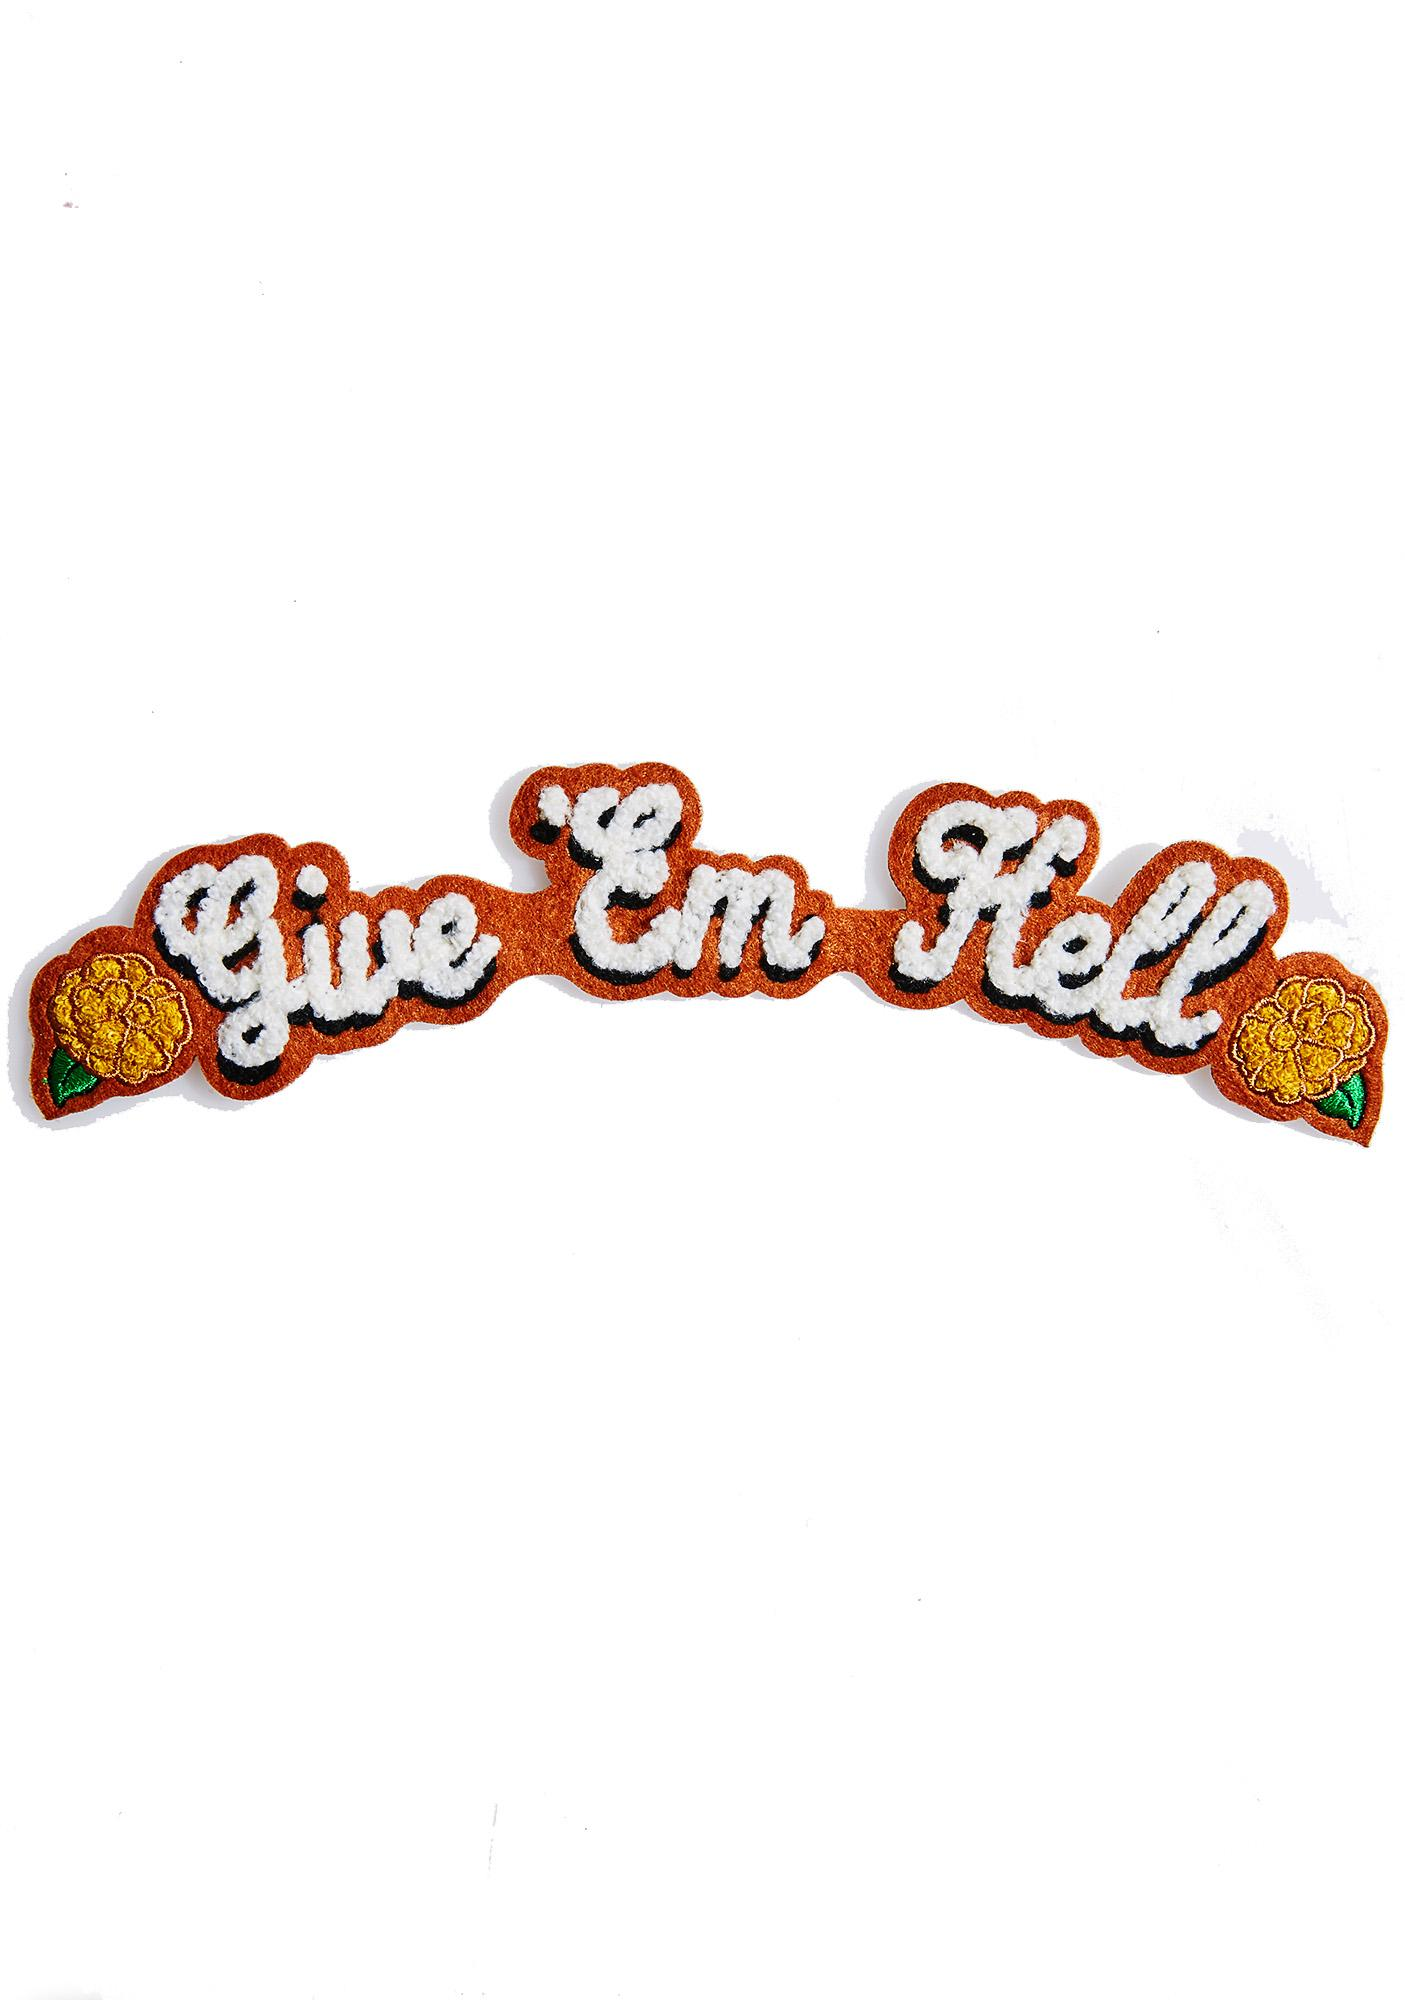 Rosehound Apparel Give 'Em Hell Back Patch